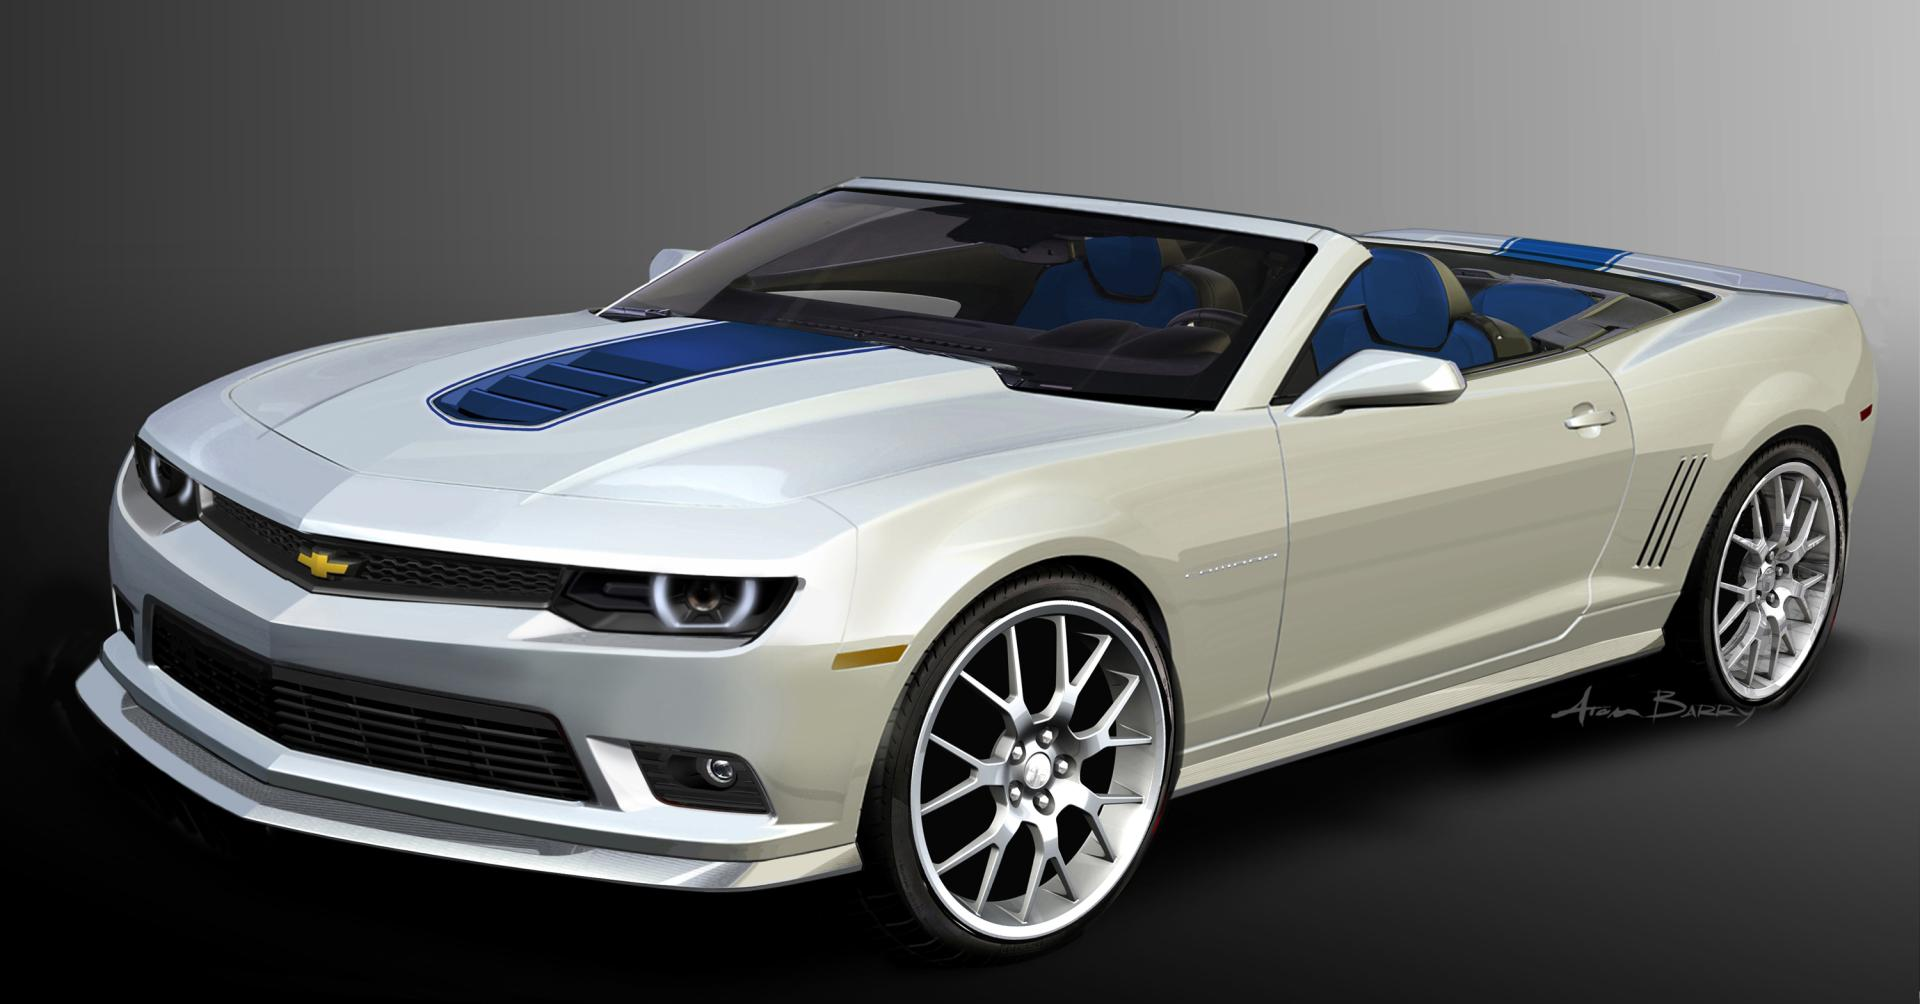 hight resolution of honda s2000 concept 2020 camaro concept www pixshark com images